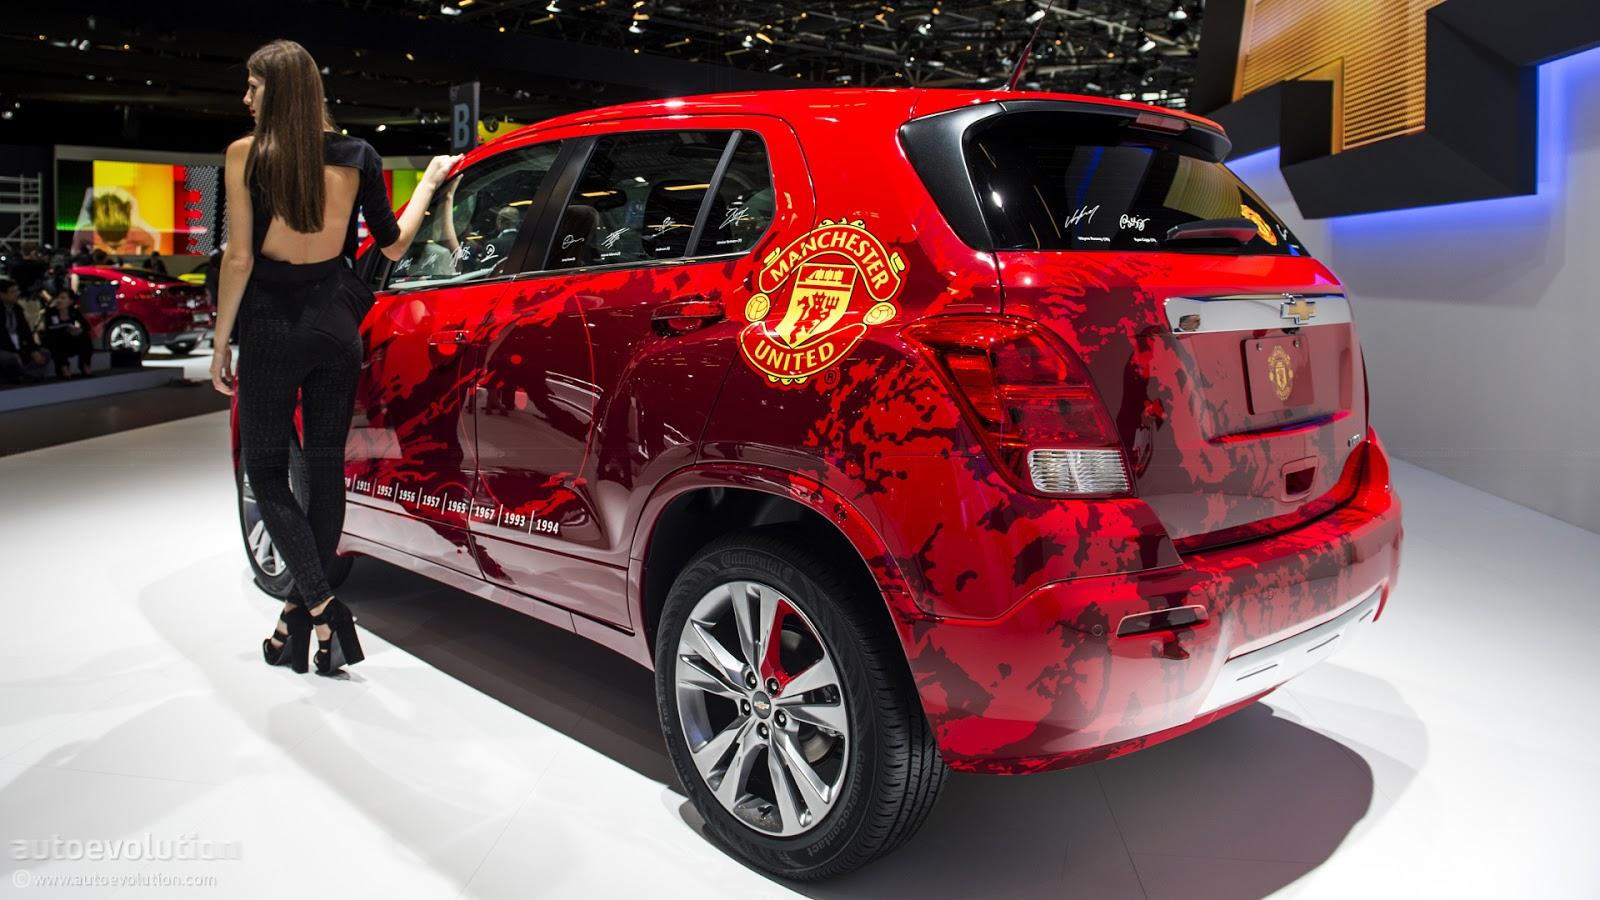 Latest Cars Models: Chevrolet trax 2013